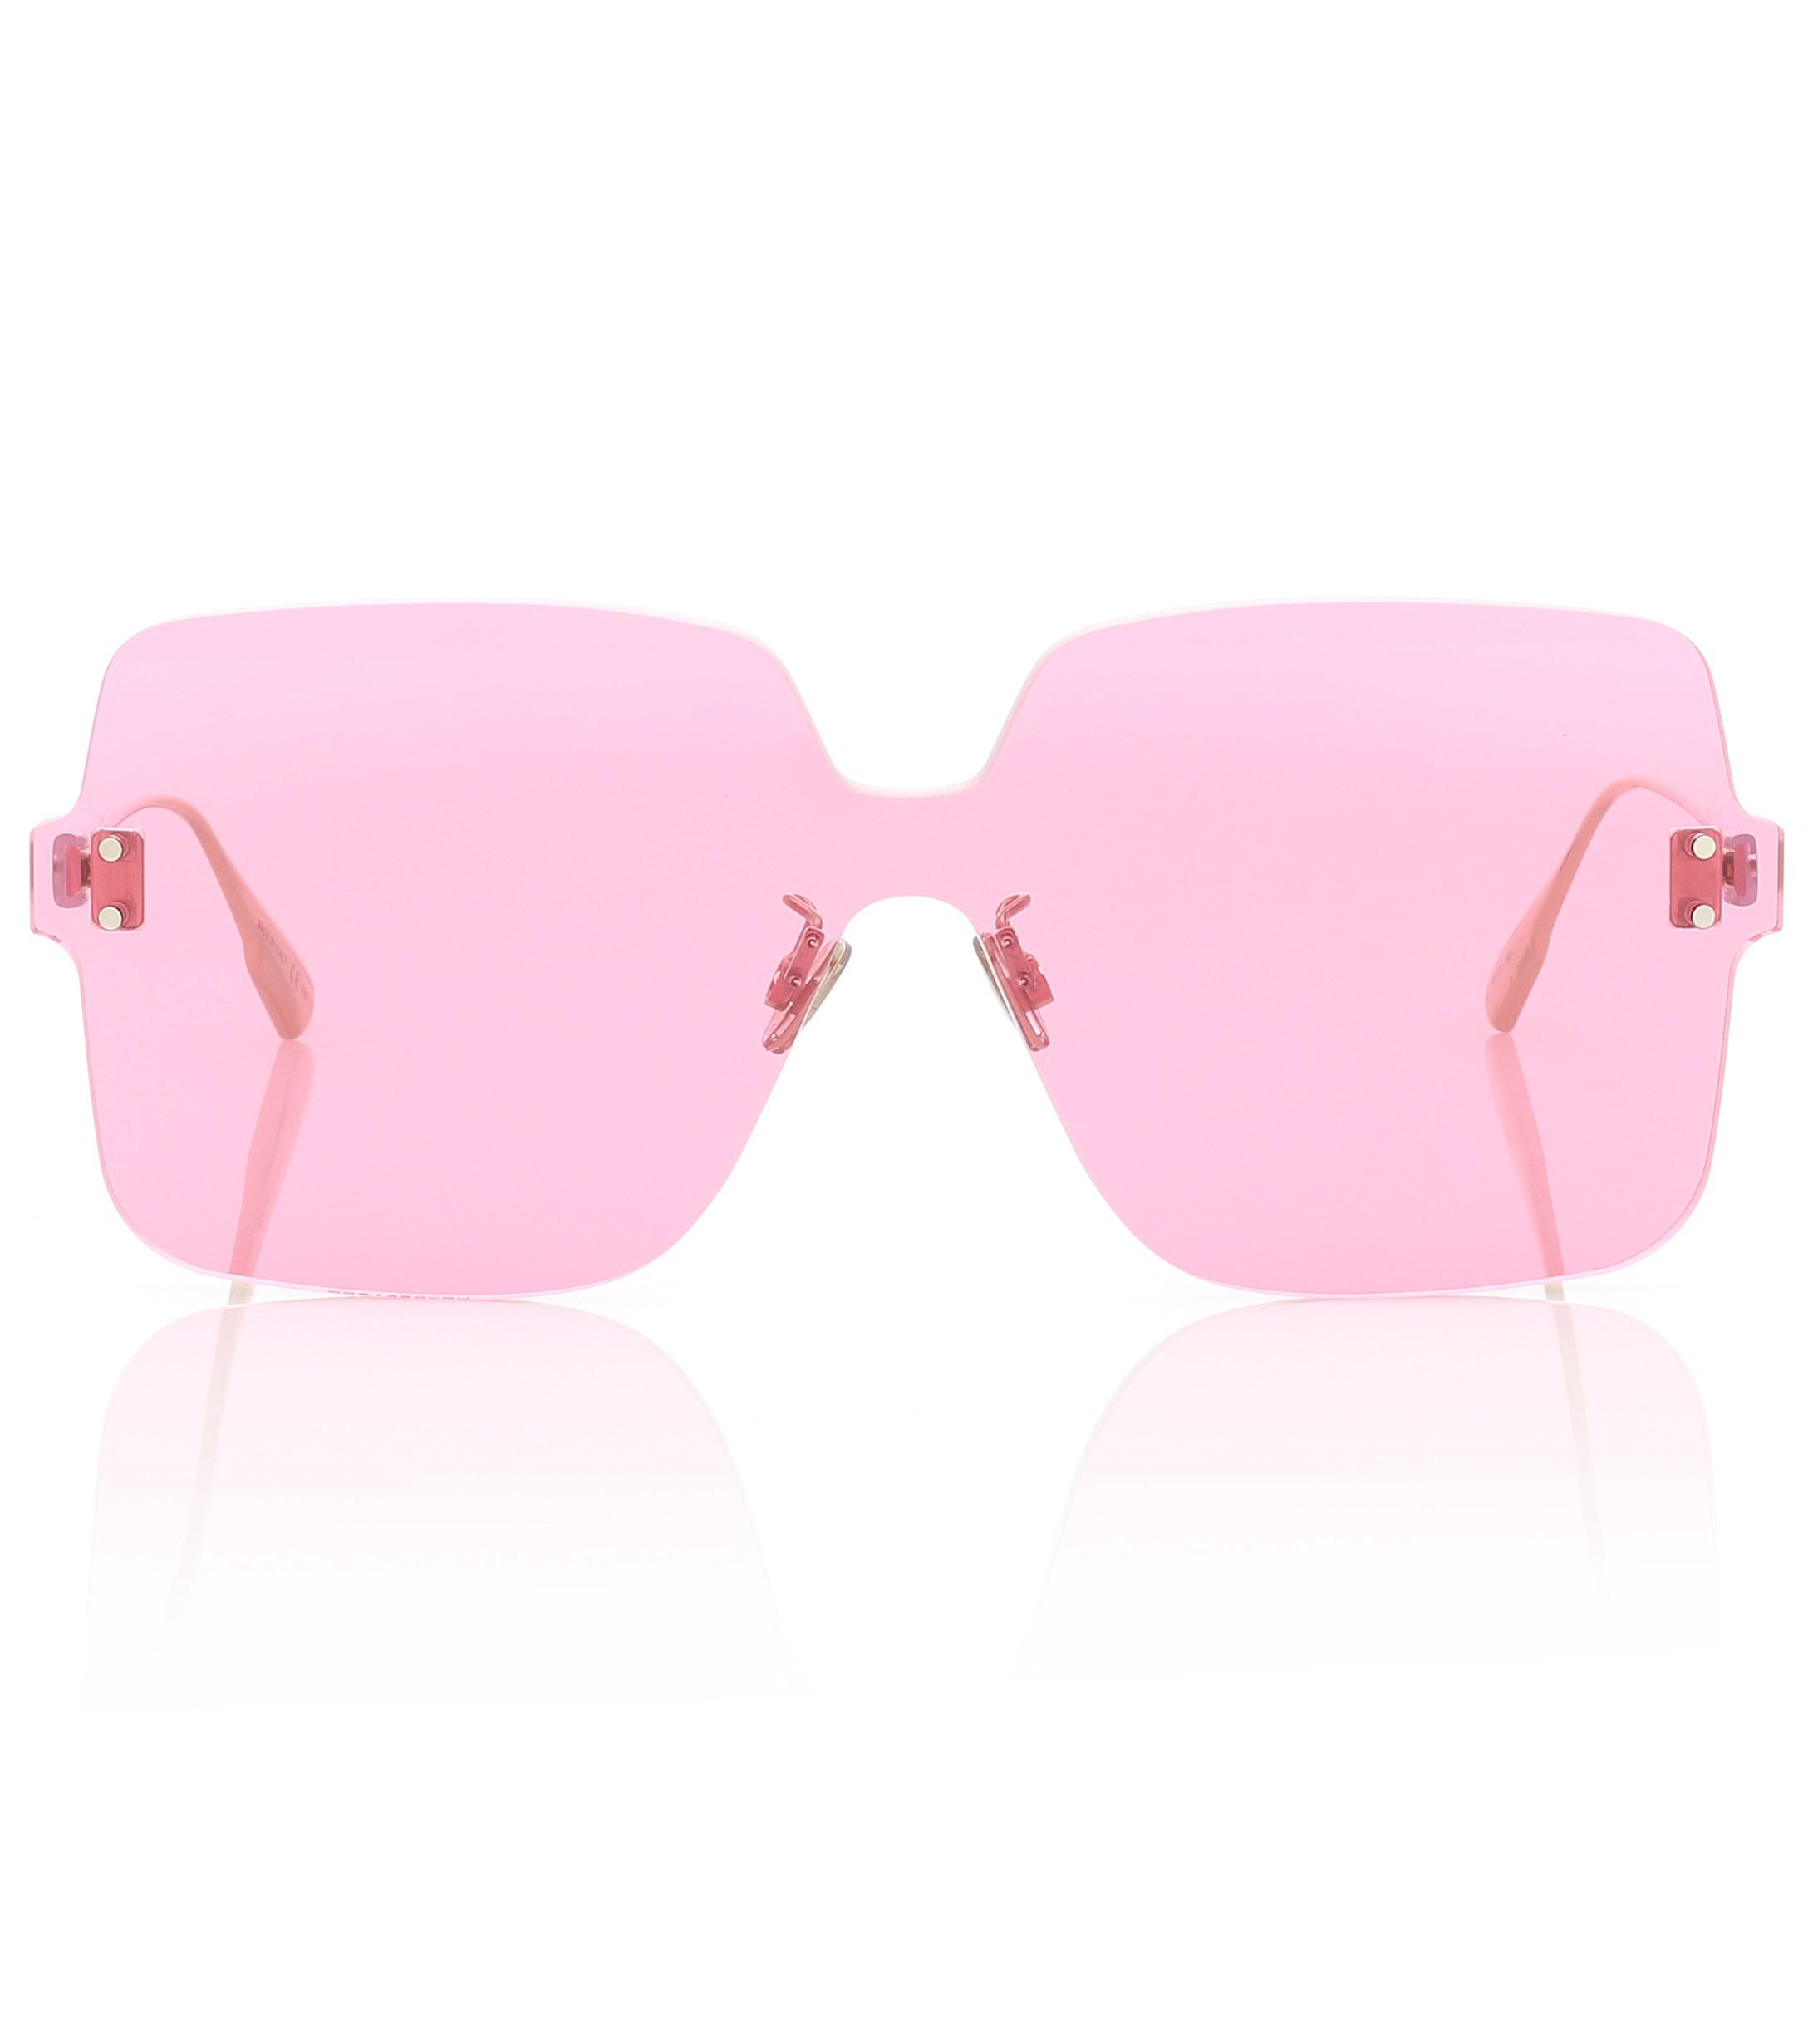 b1b9c820abeff Dior Diorcolorquake1 Square Sunglasses in Pink - Save 5% - Lyst